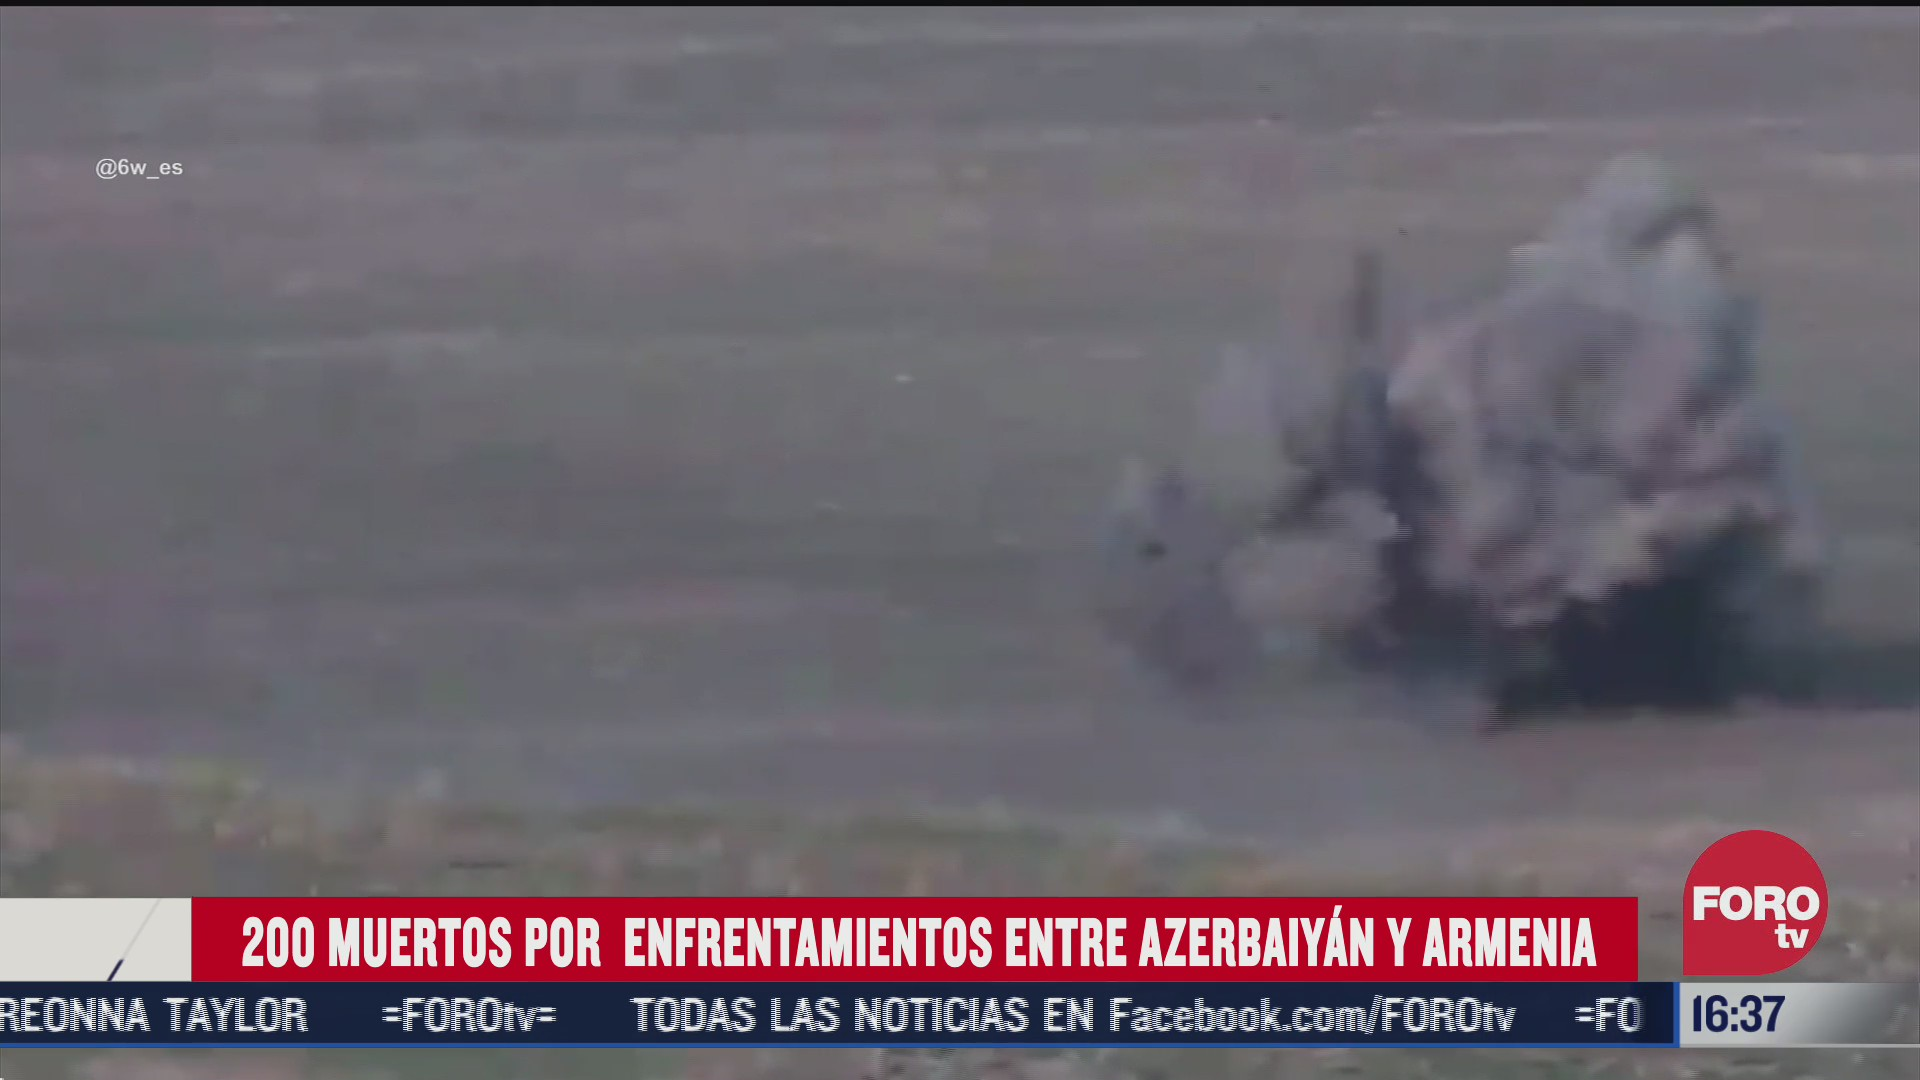 armenia reporta 200 militares muertos